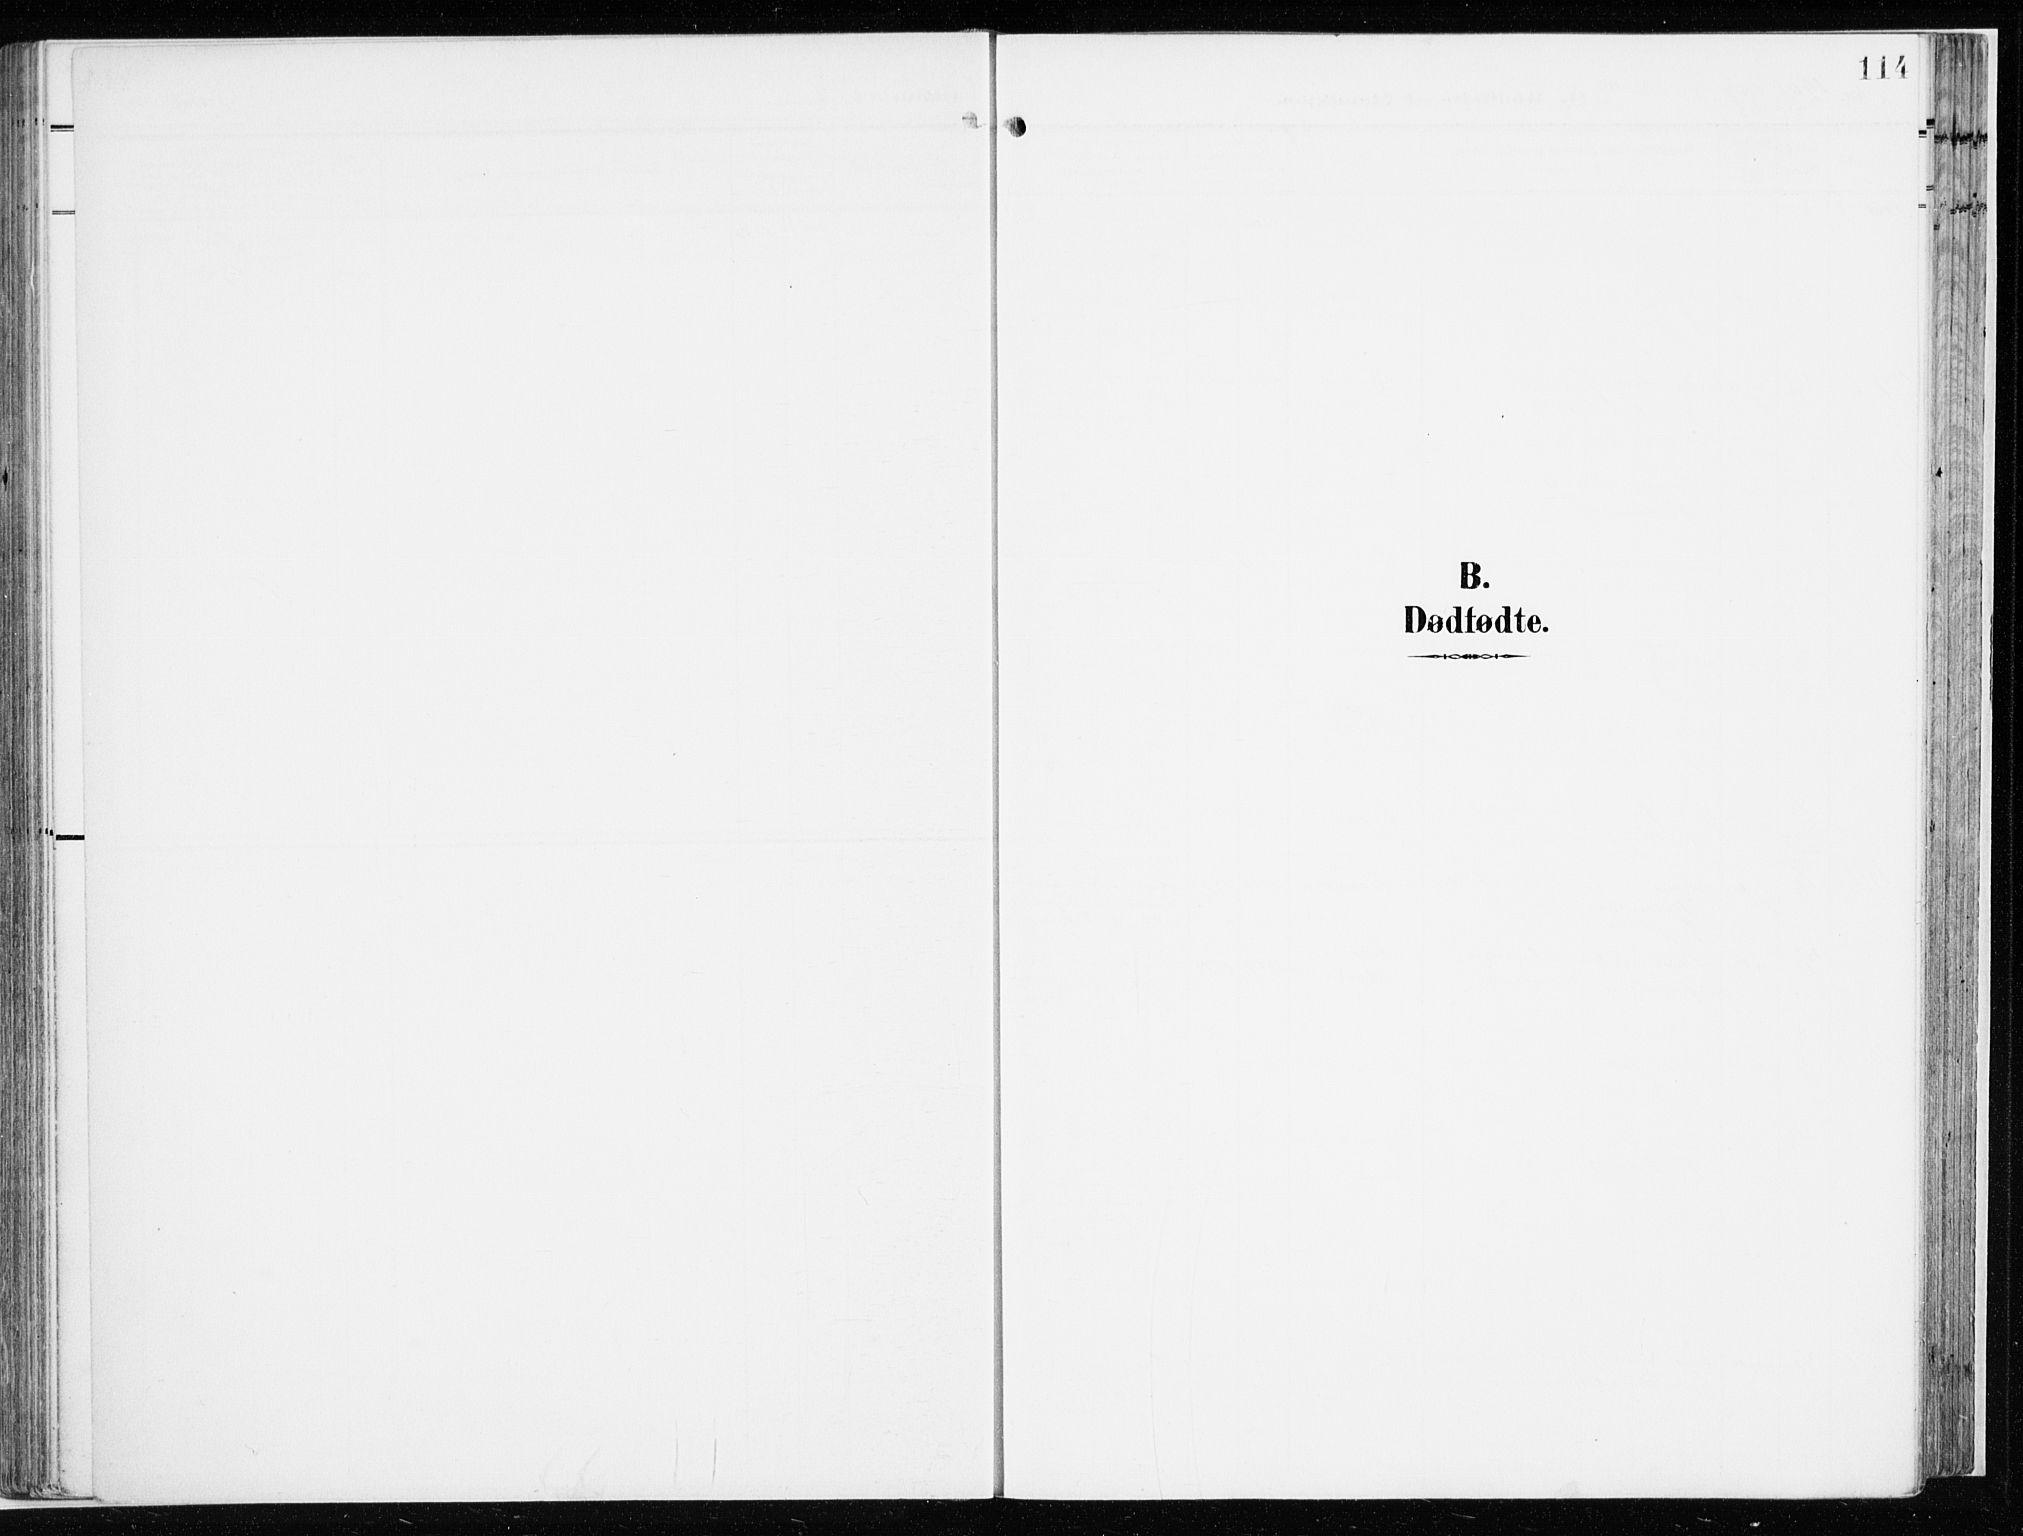 SAH, Løten prestekontor, K/Ka/L0011: Ministerialbok nr. 11, 1908-1917, s. 114